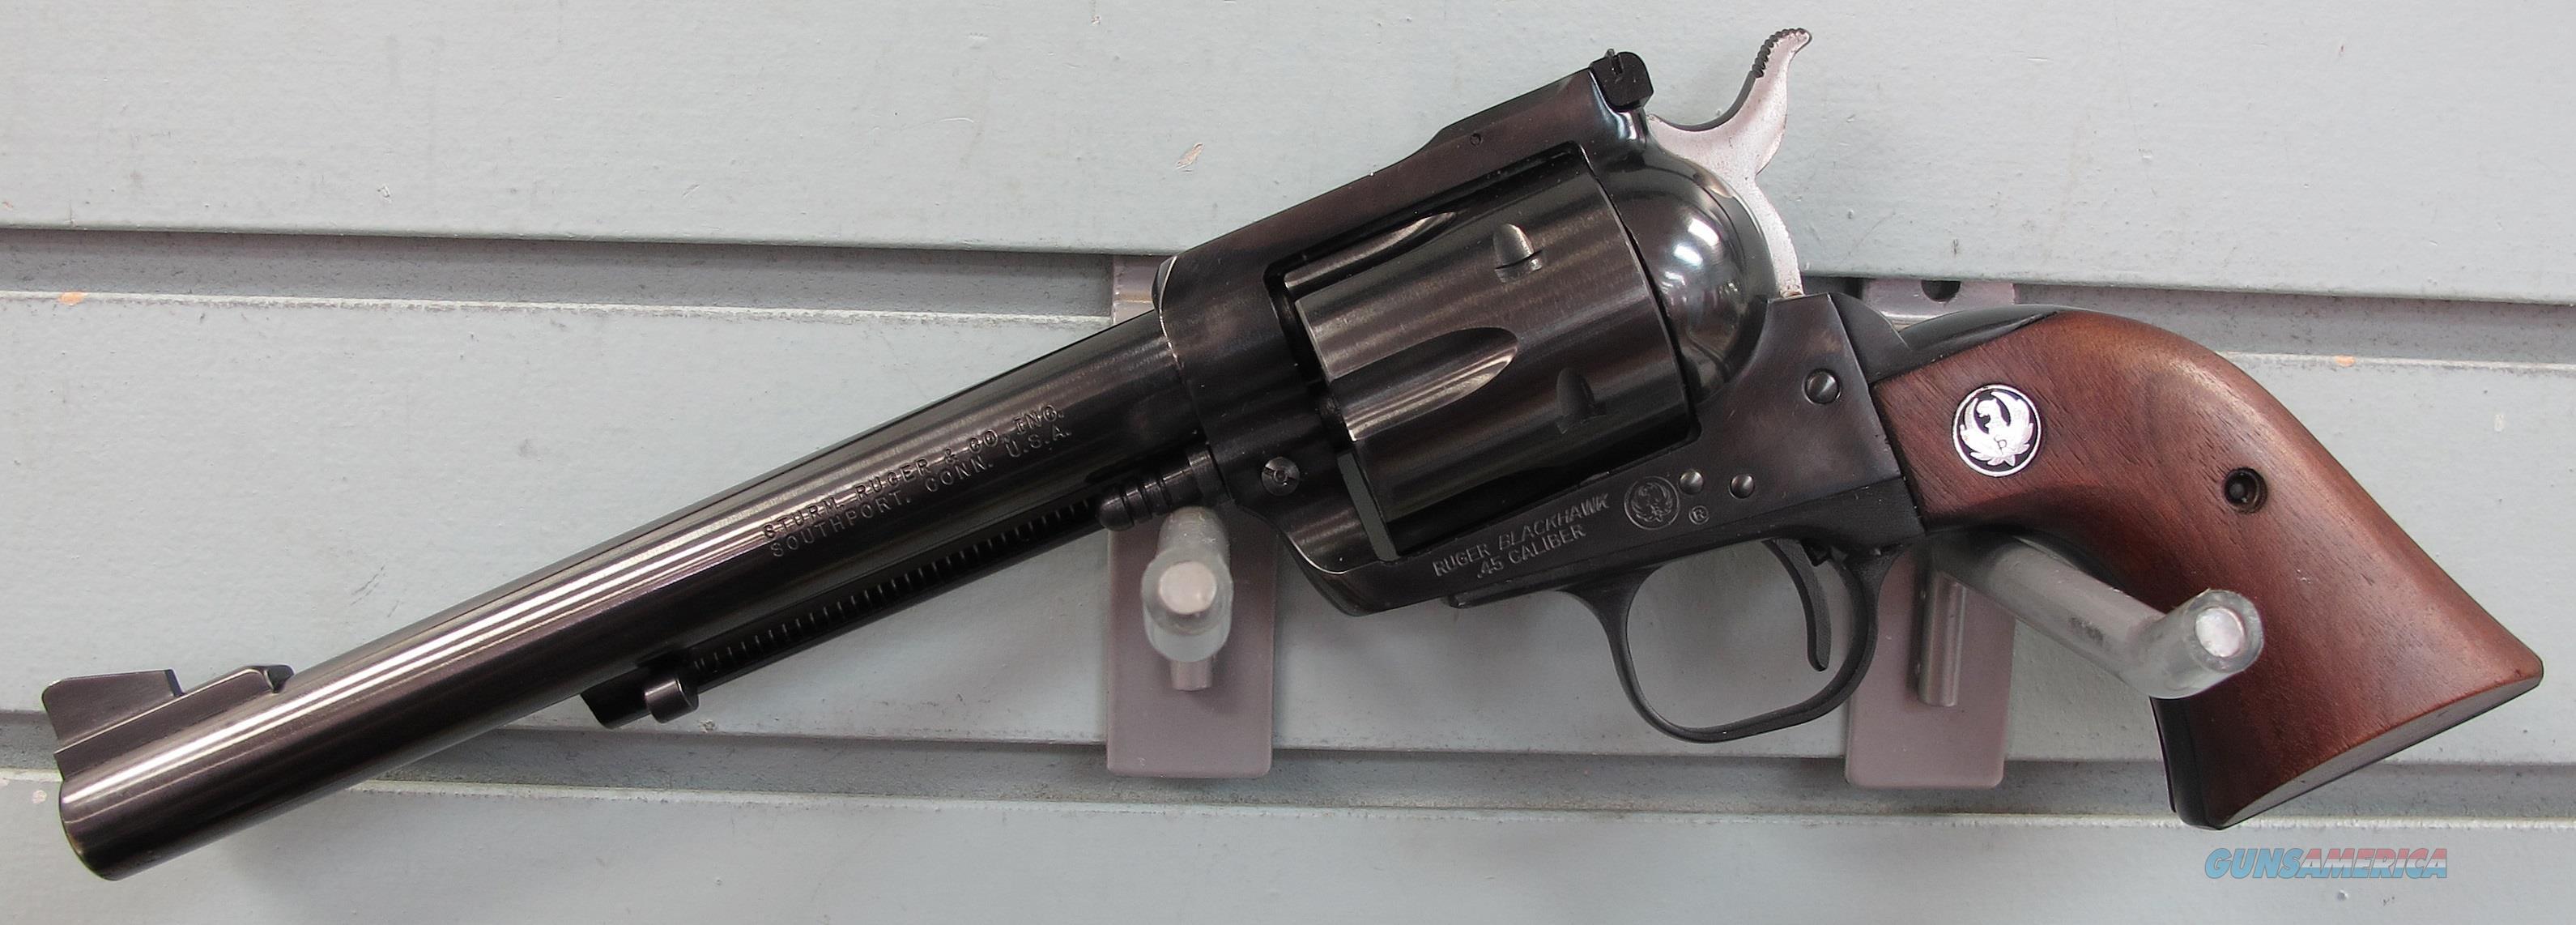 RUGER BLACKHAWK THREE SCREW REVOLVER  Guns > Pistols > Ruger Single Action Revolvers > Blackhawk Type